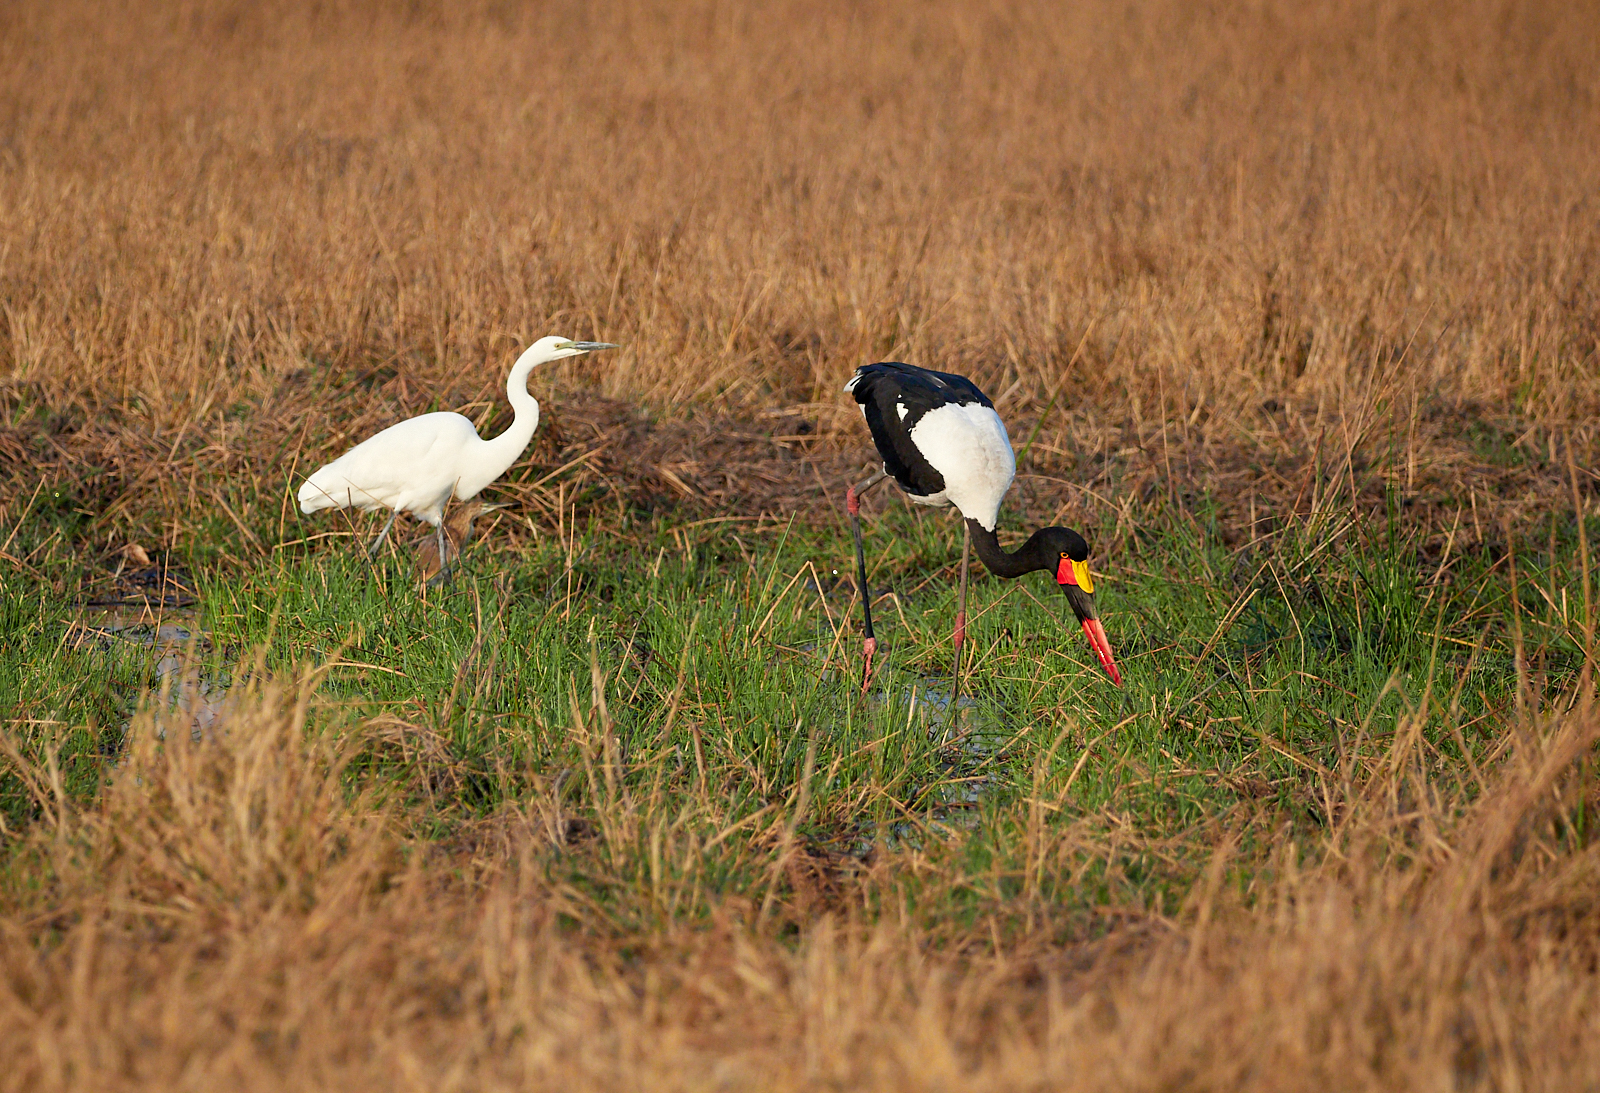 Egret and Saddle-billed stork 1600x1200 sRGB.jpg